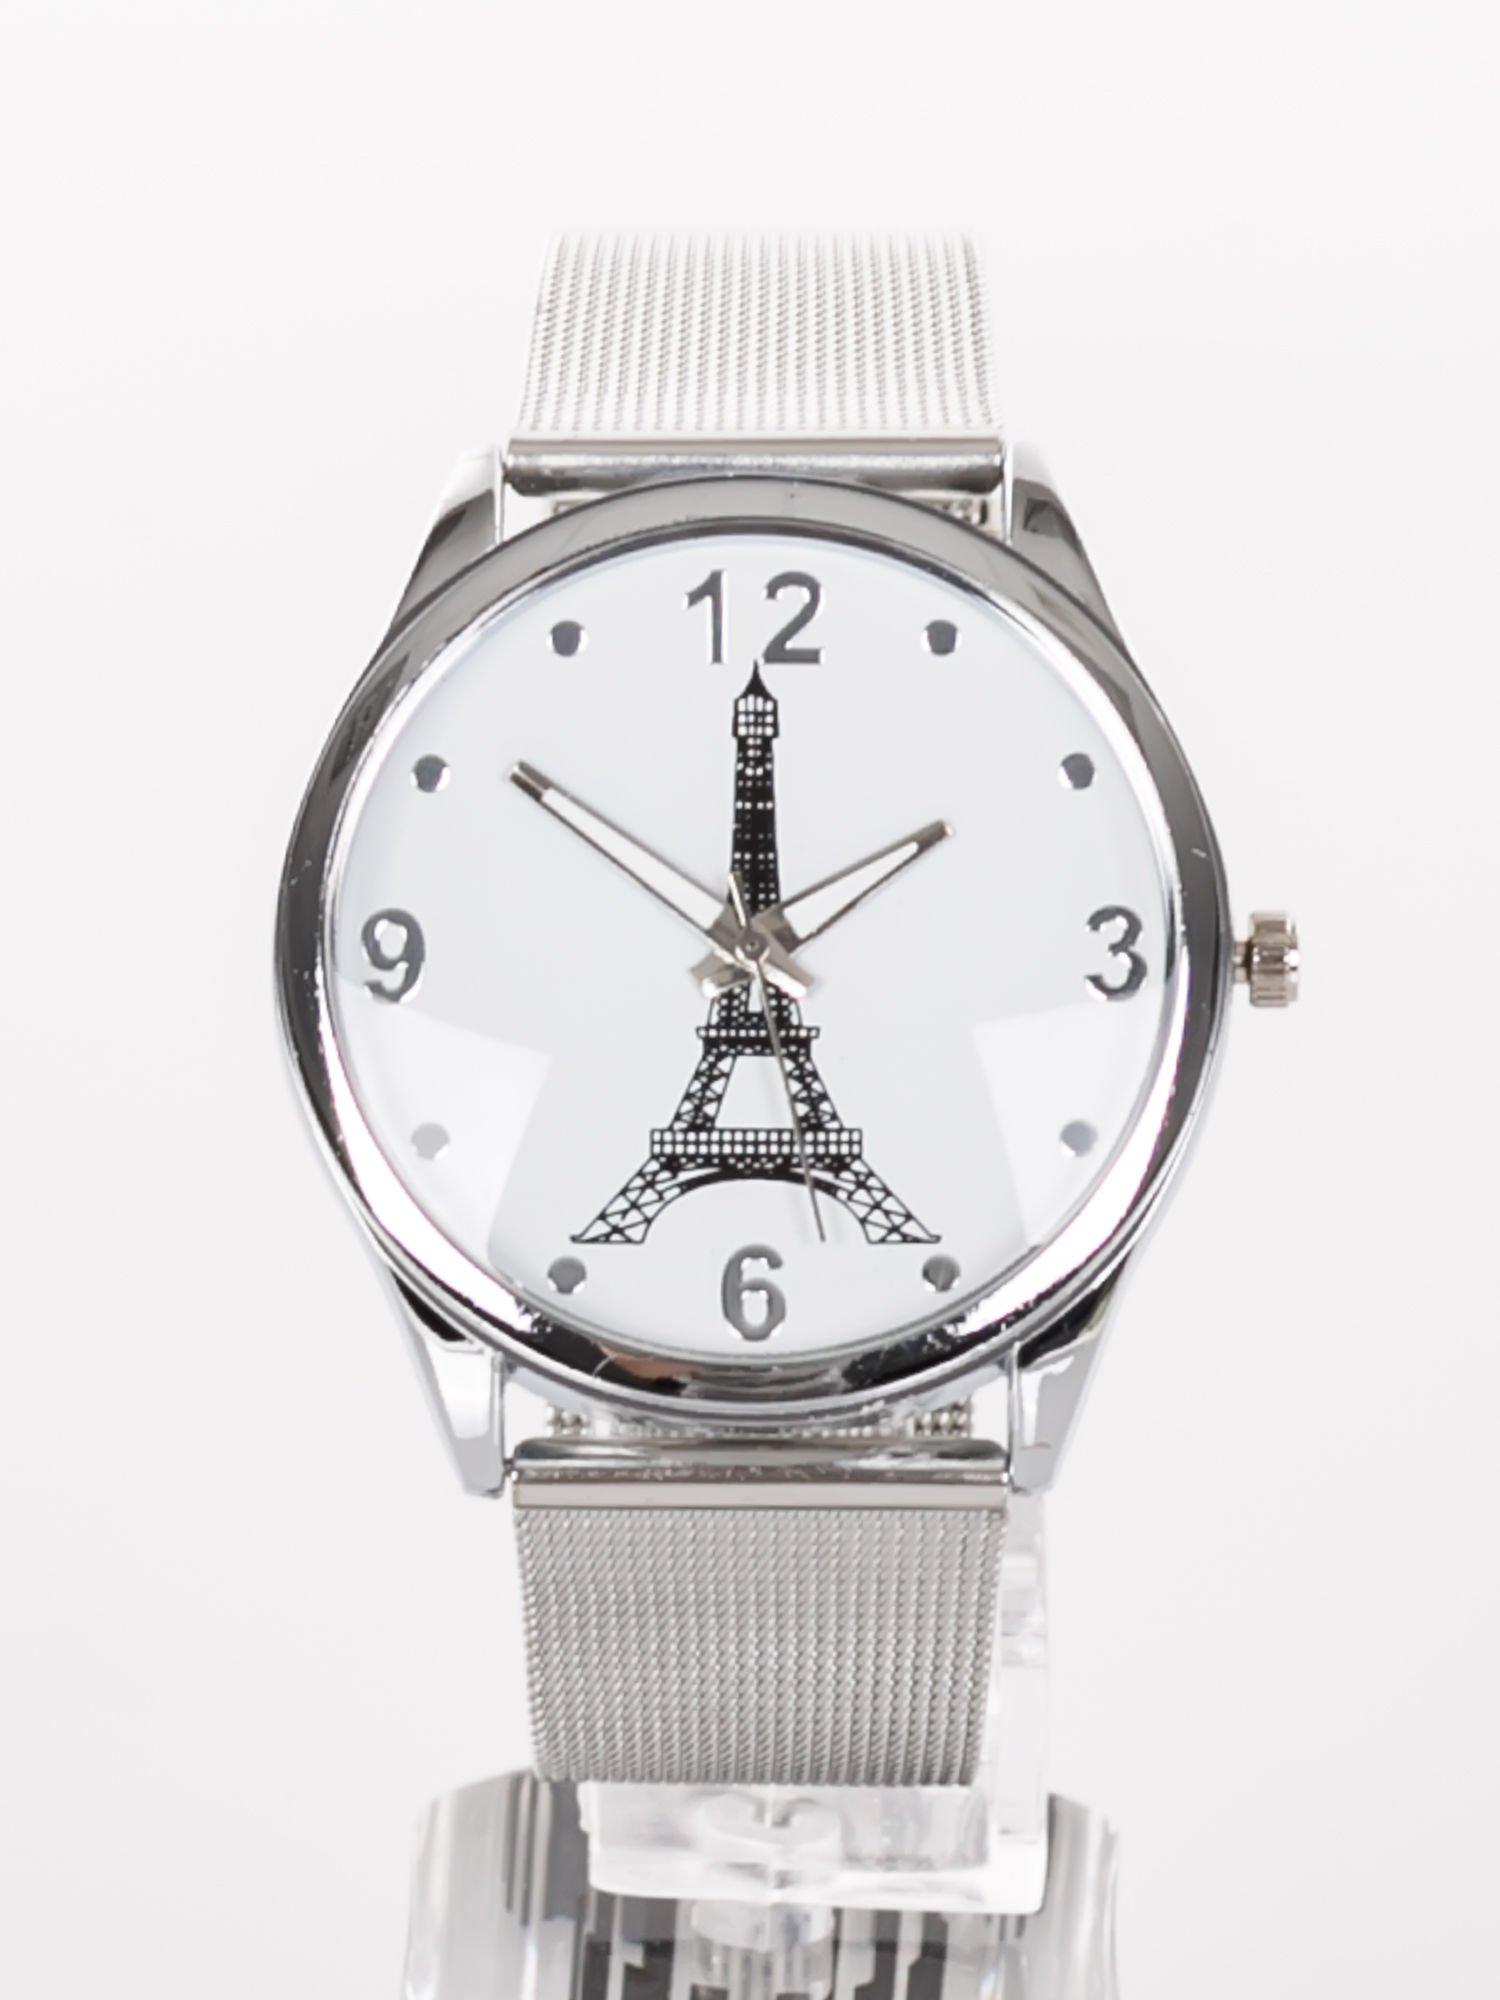 d89e823c91000c GENEVA Eiffel Tower -Klasyka i elegancja srebrny damski zegarek z biała  tarczą ...